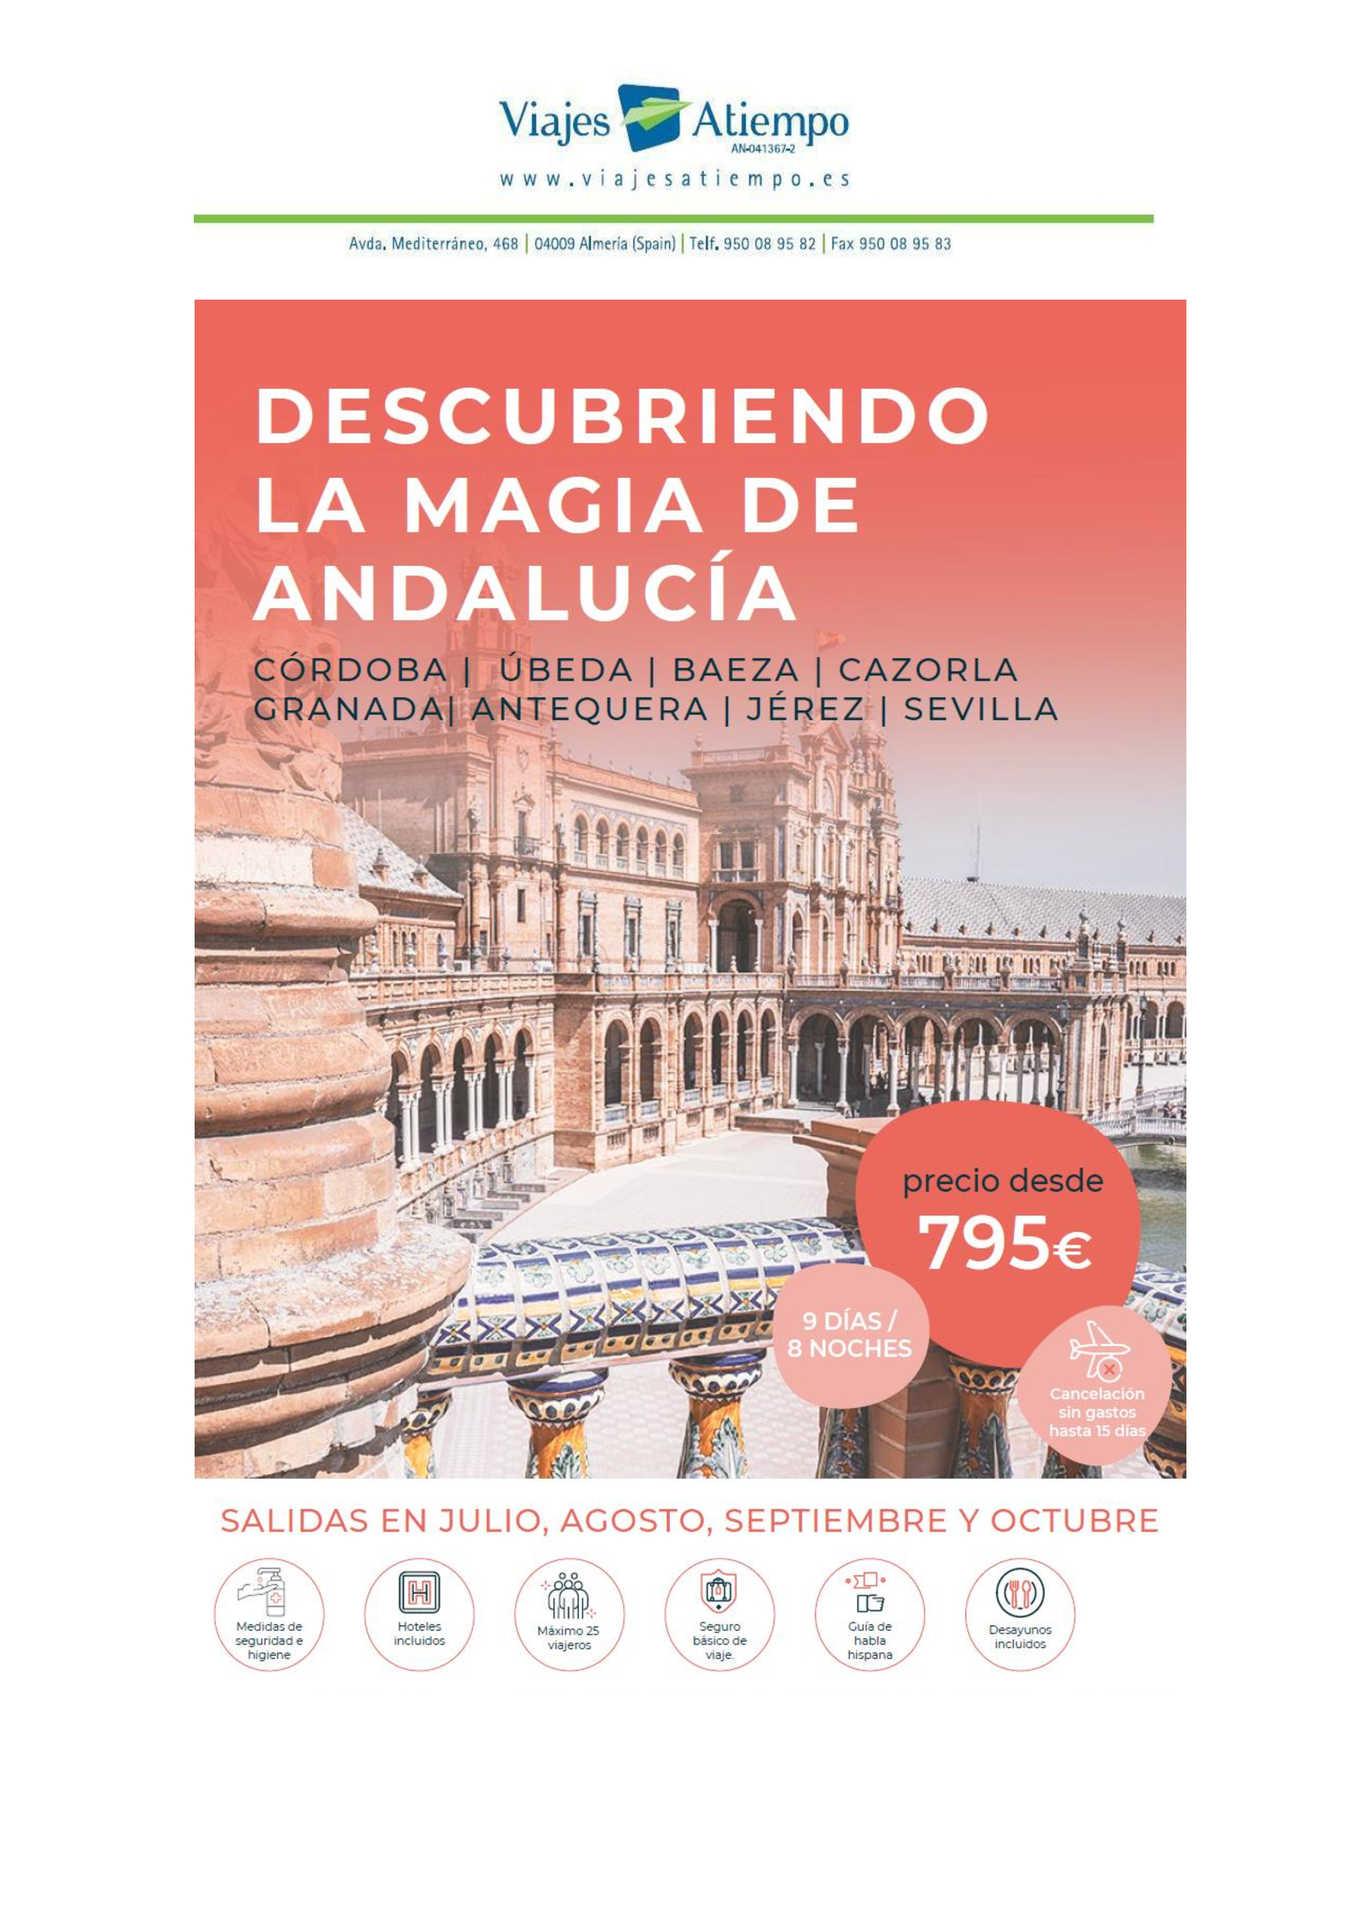 Descubre la Magia de Andalucía